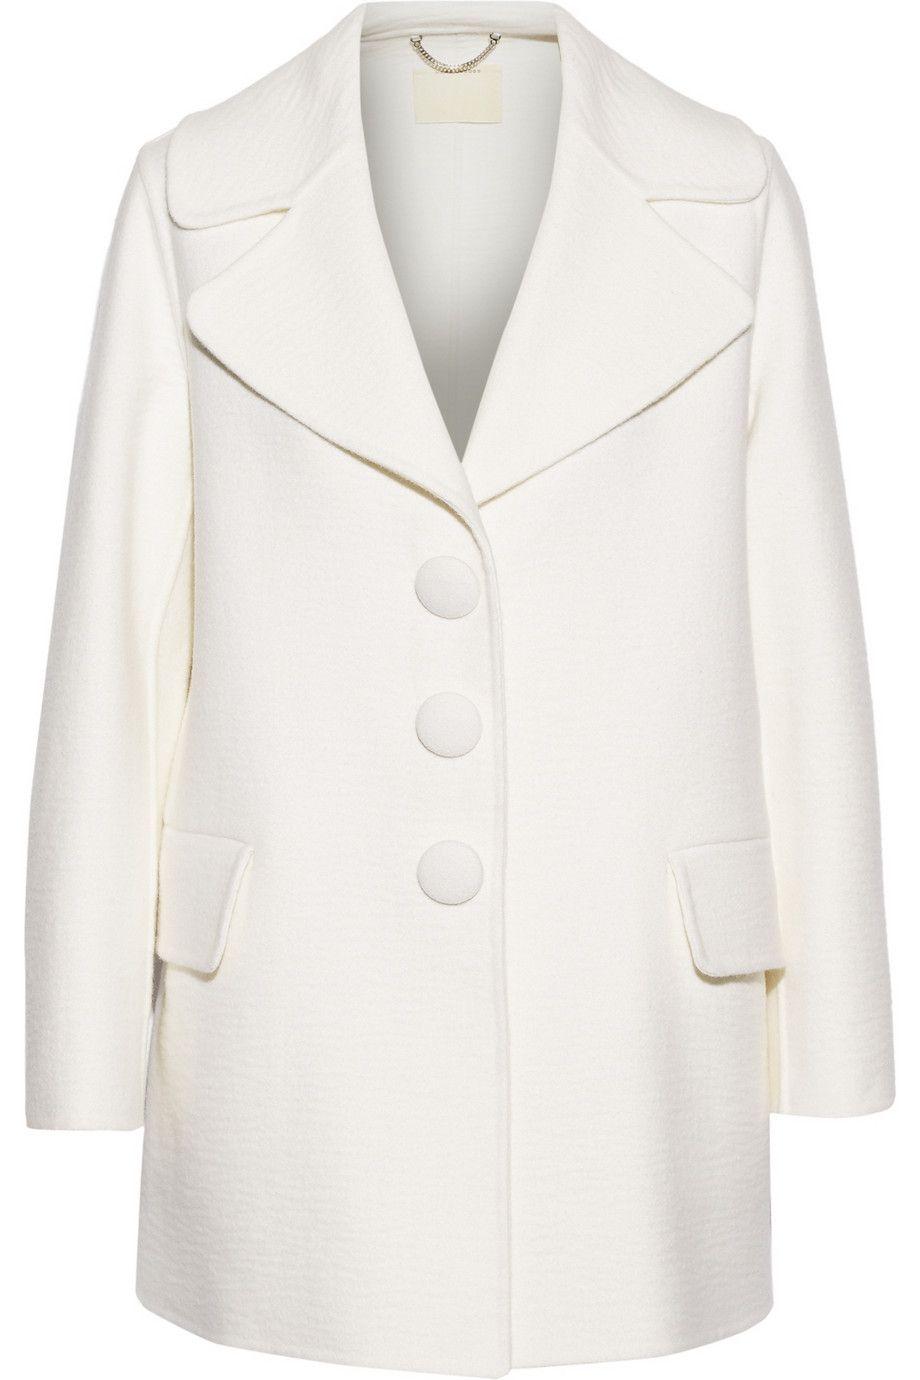 Marc Jacobs | Metallic bouclé wool blend jacket | NET A